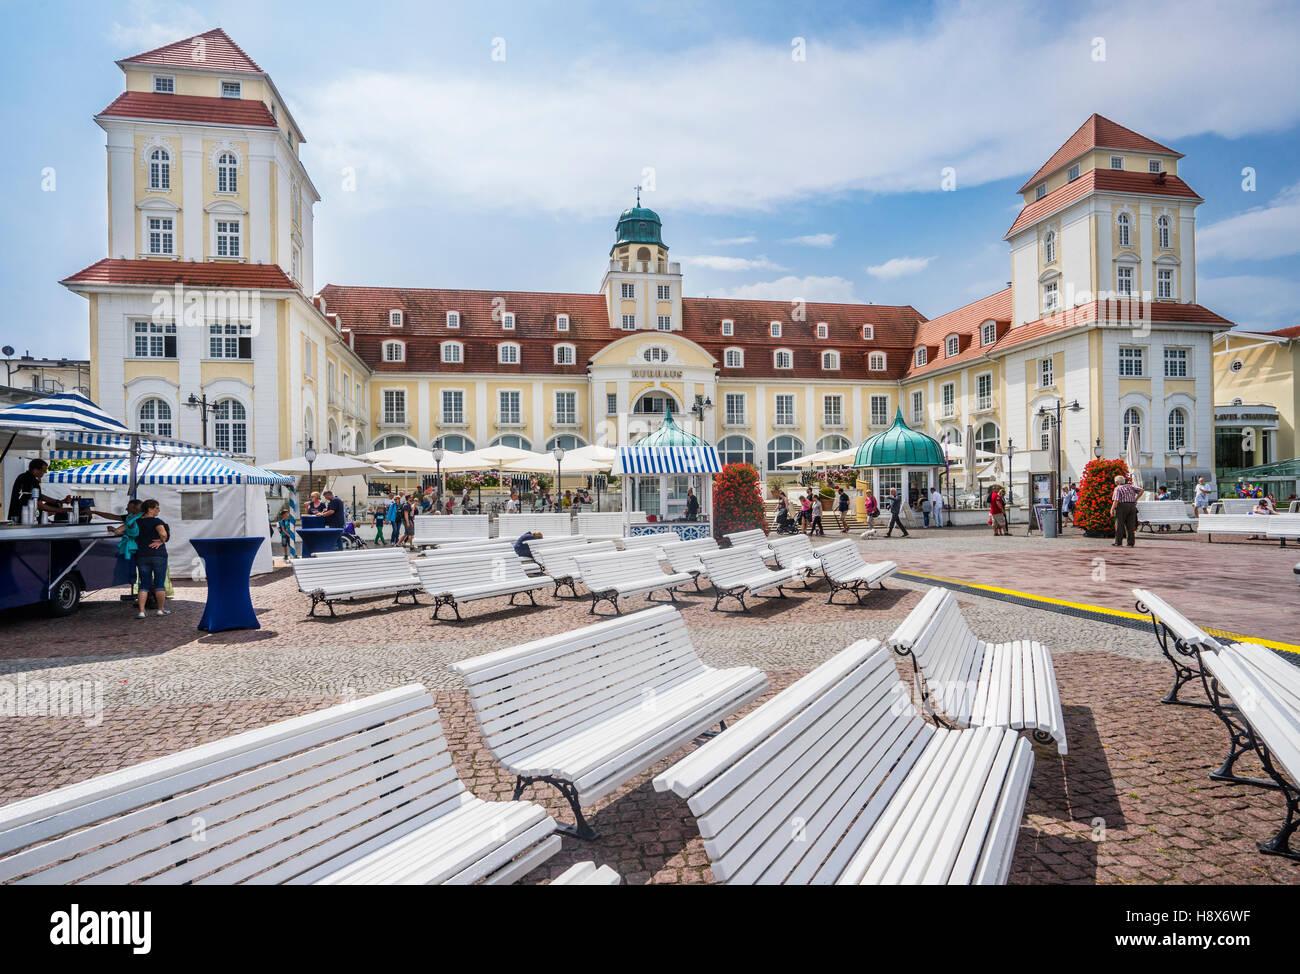 Grand Hotel Kurhaus, Baltic Sea resort Binz on the island of Rügen, Mecklenburg-Vorpommern, Germany - Stock Image